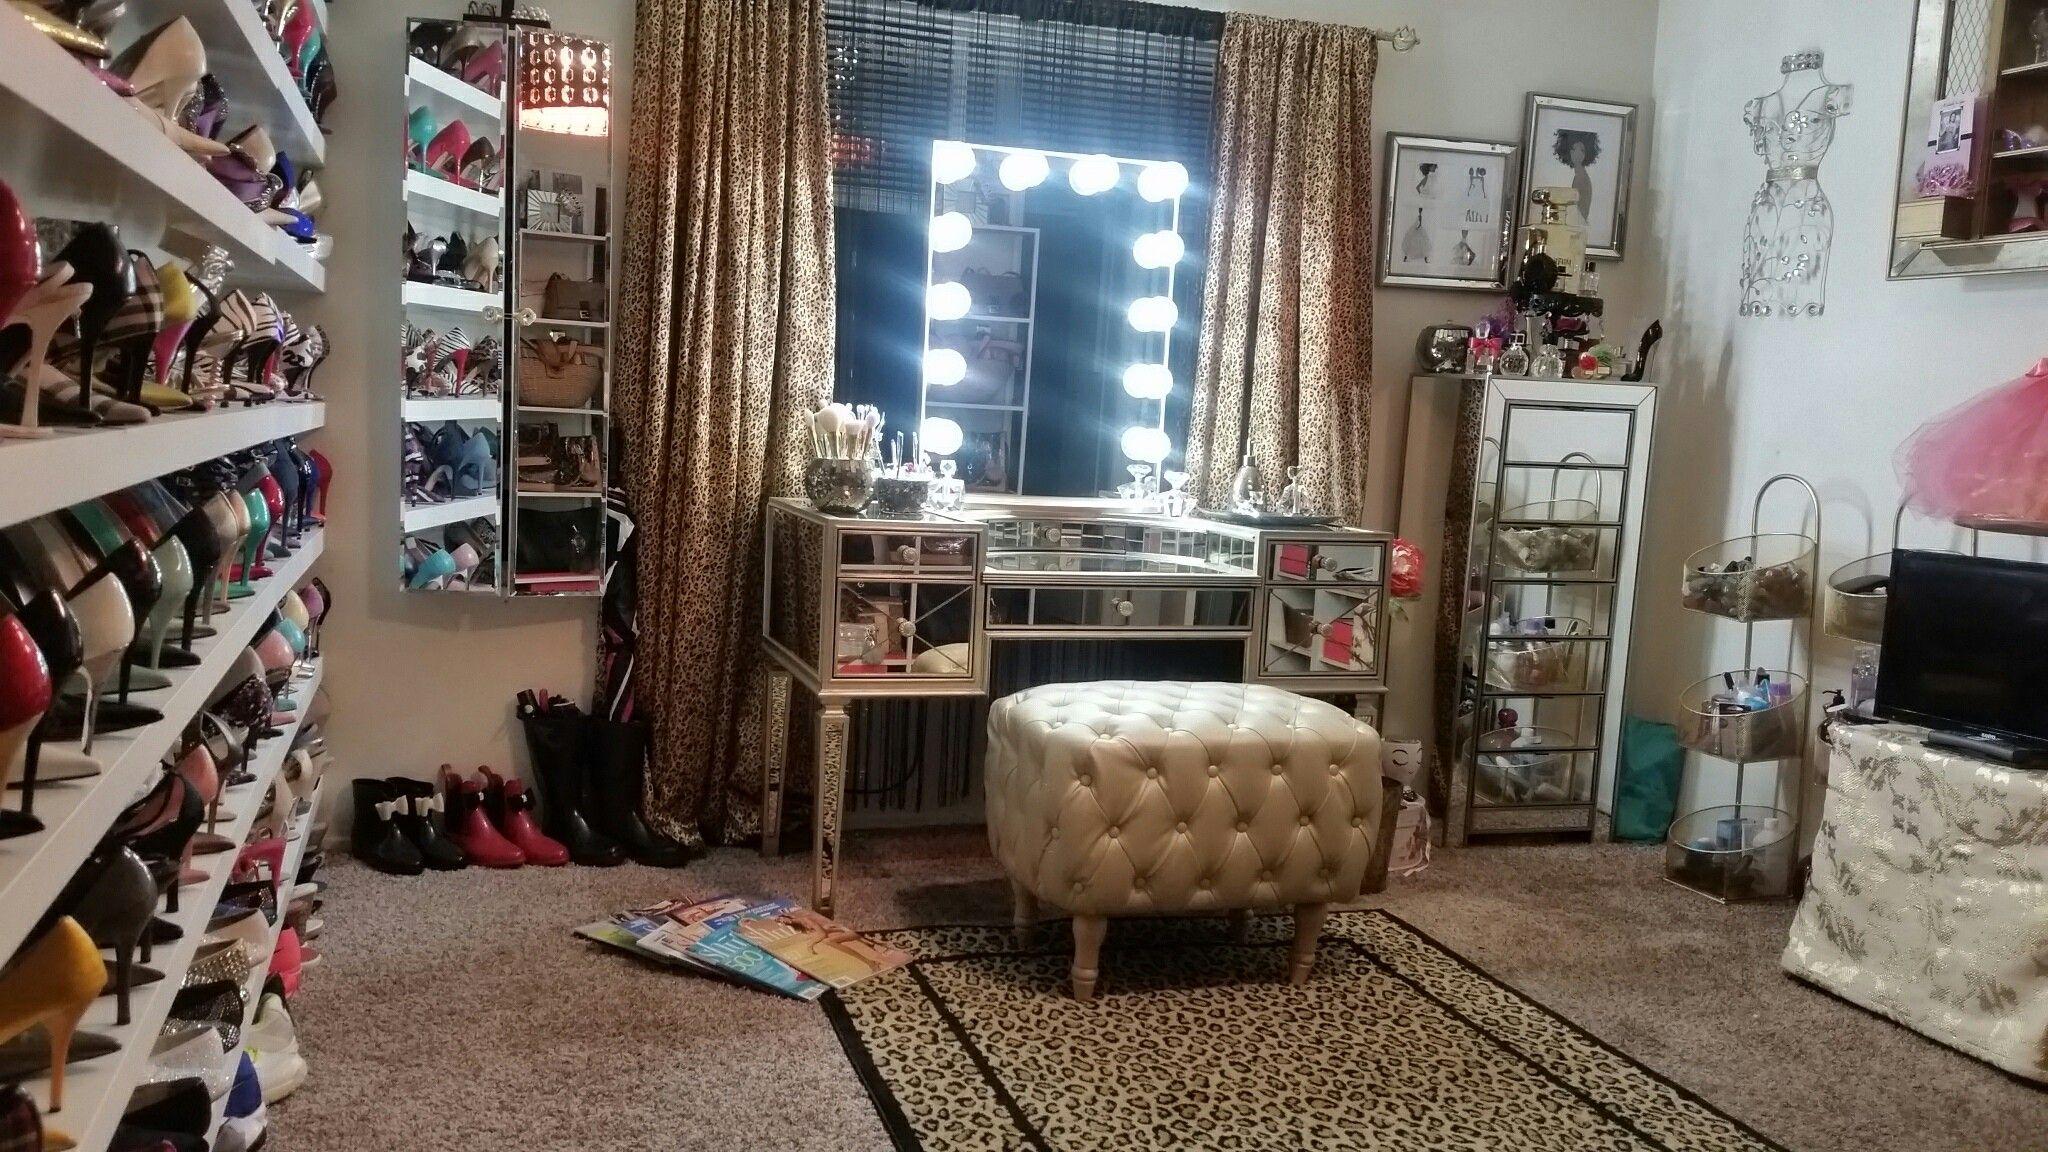 Dressing room, Closet room, Vanity room, Walkin Closet